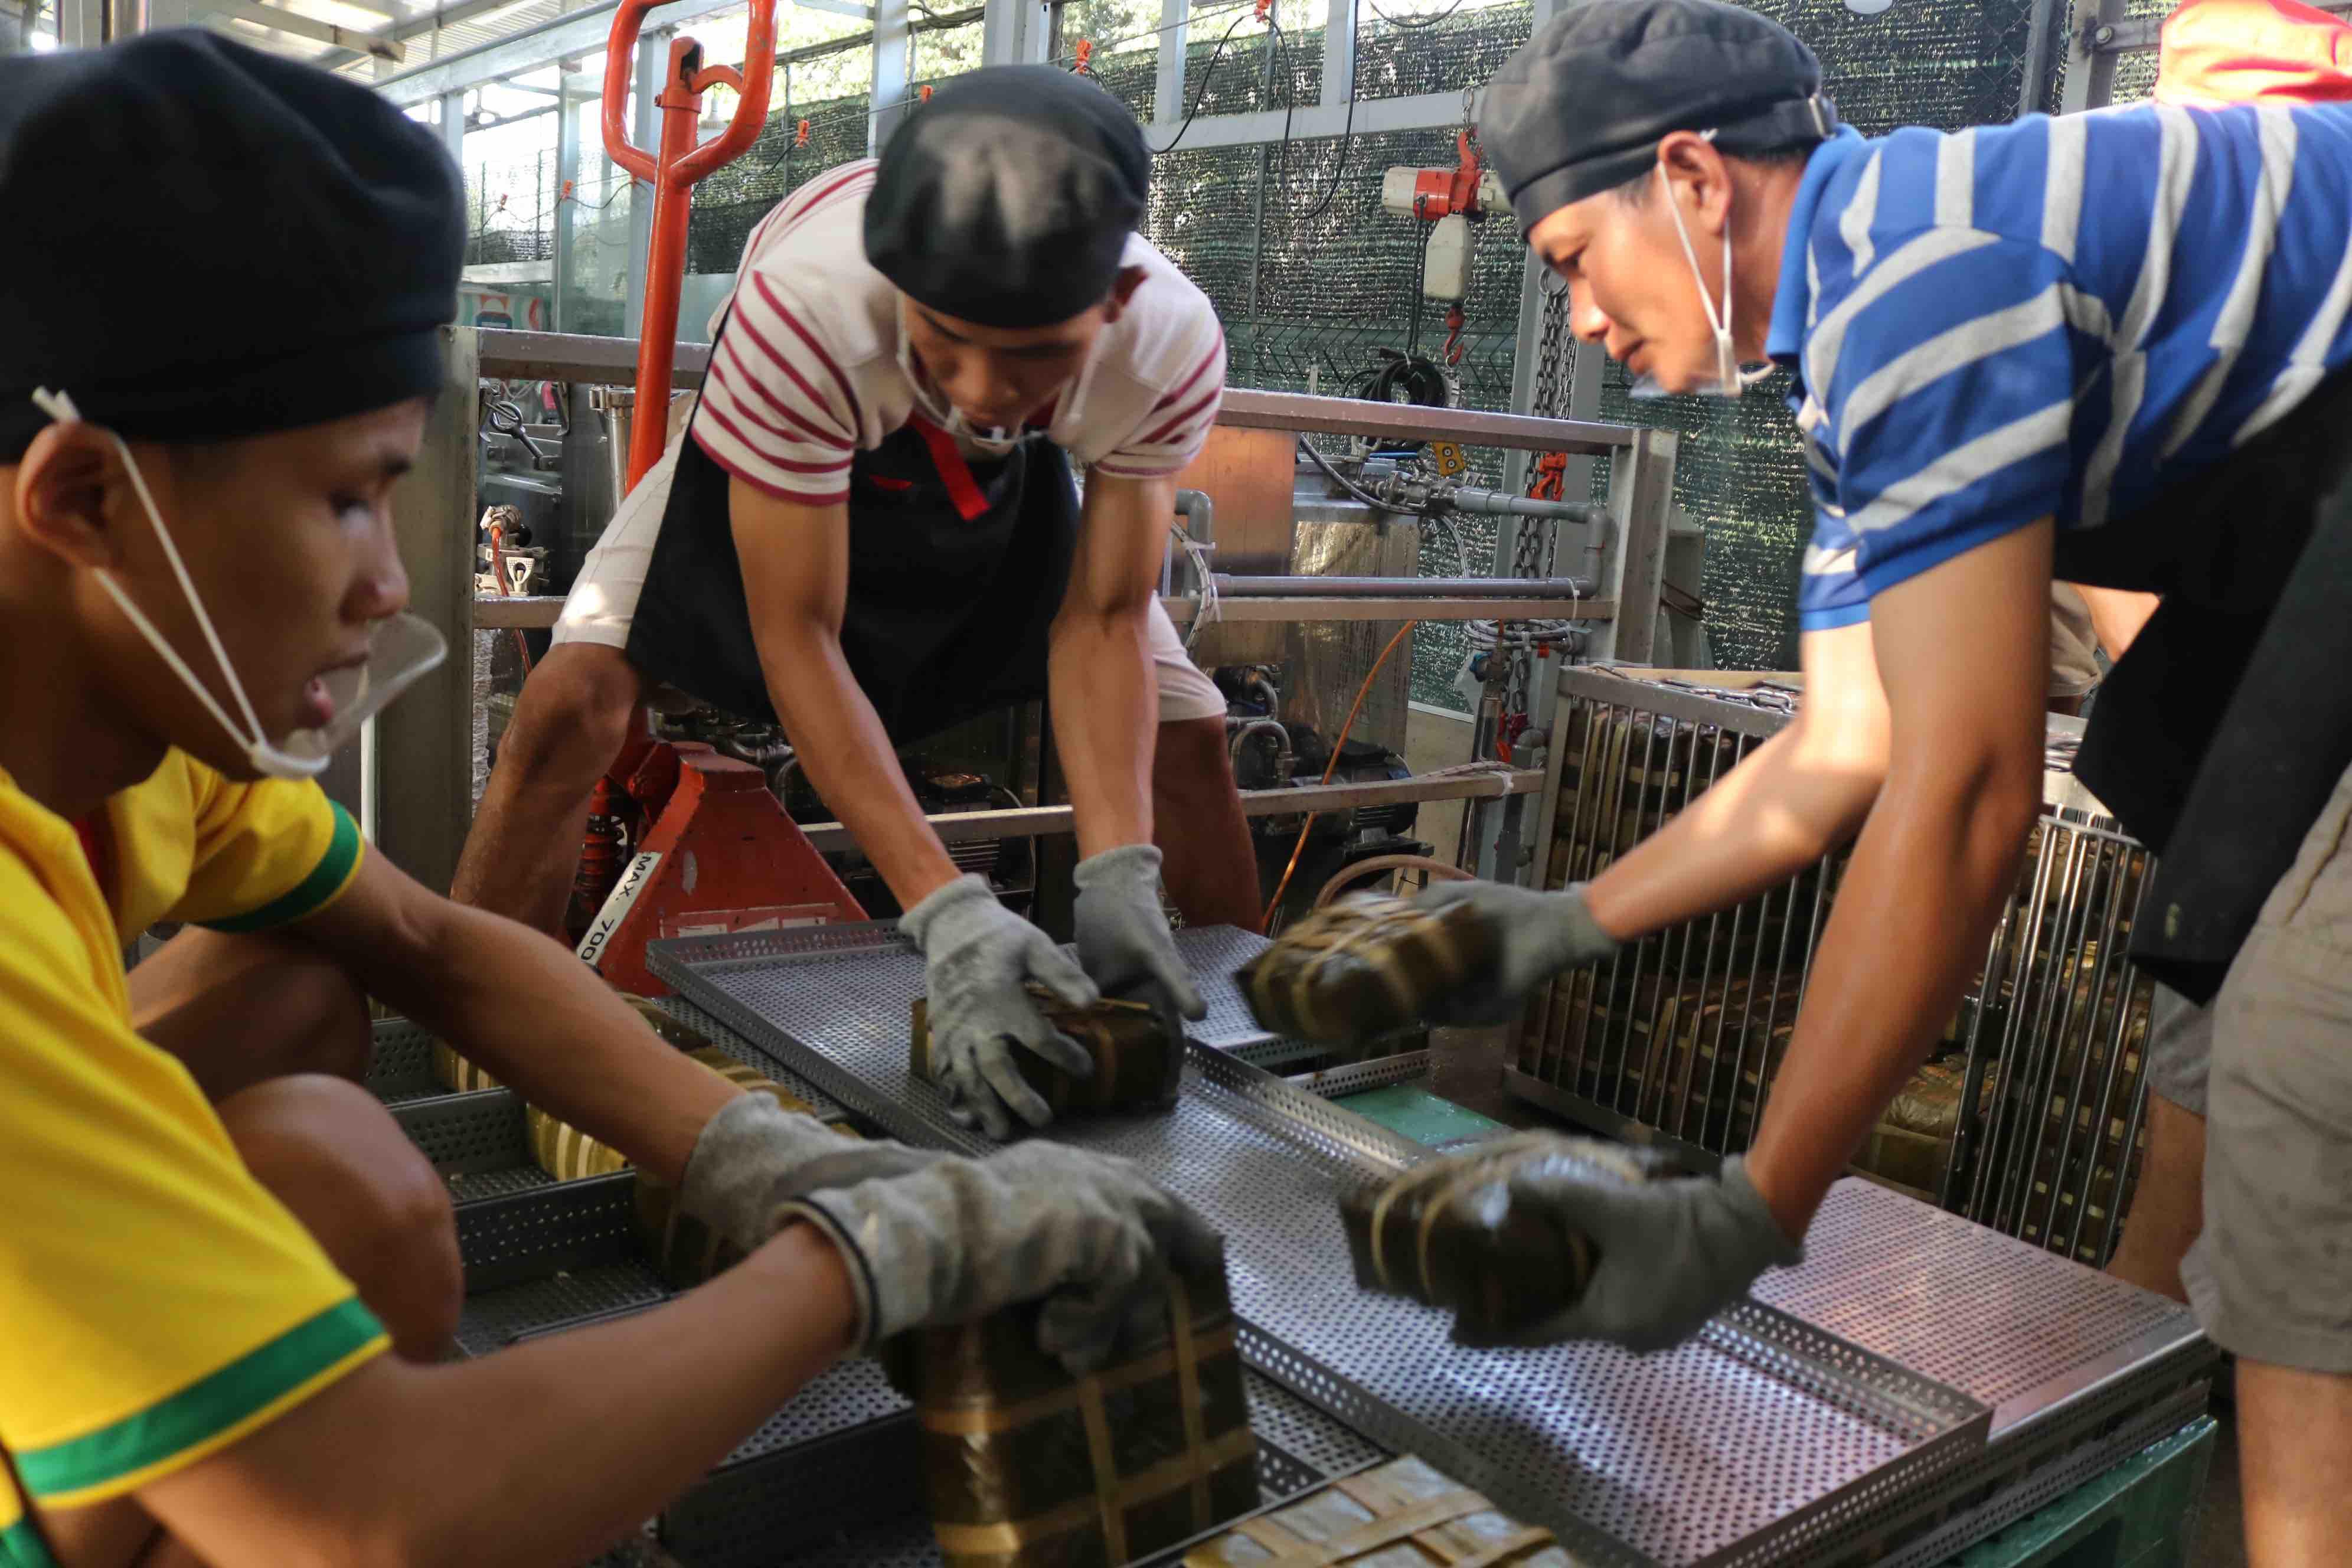 Staff at Pham Khac Tuong's facility arrange the finished banh chung at Thu Duc City. Photo: Hoang An / Tuoi Tre